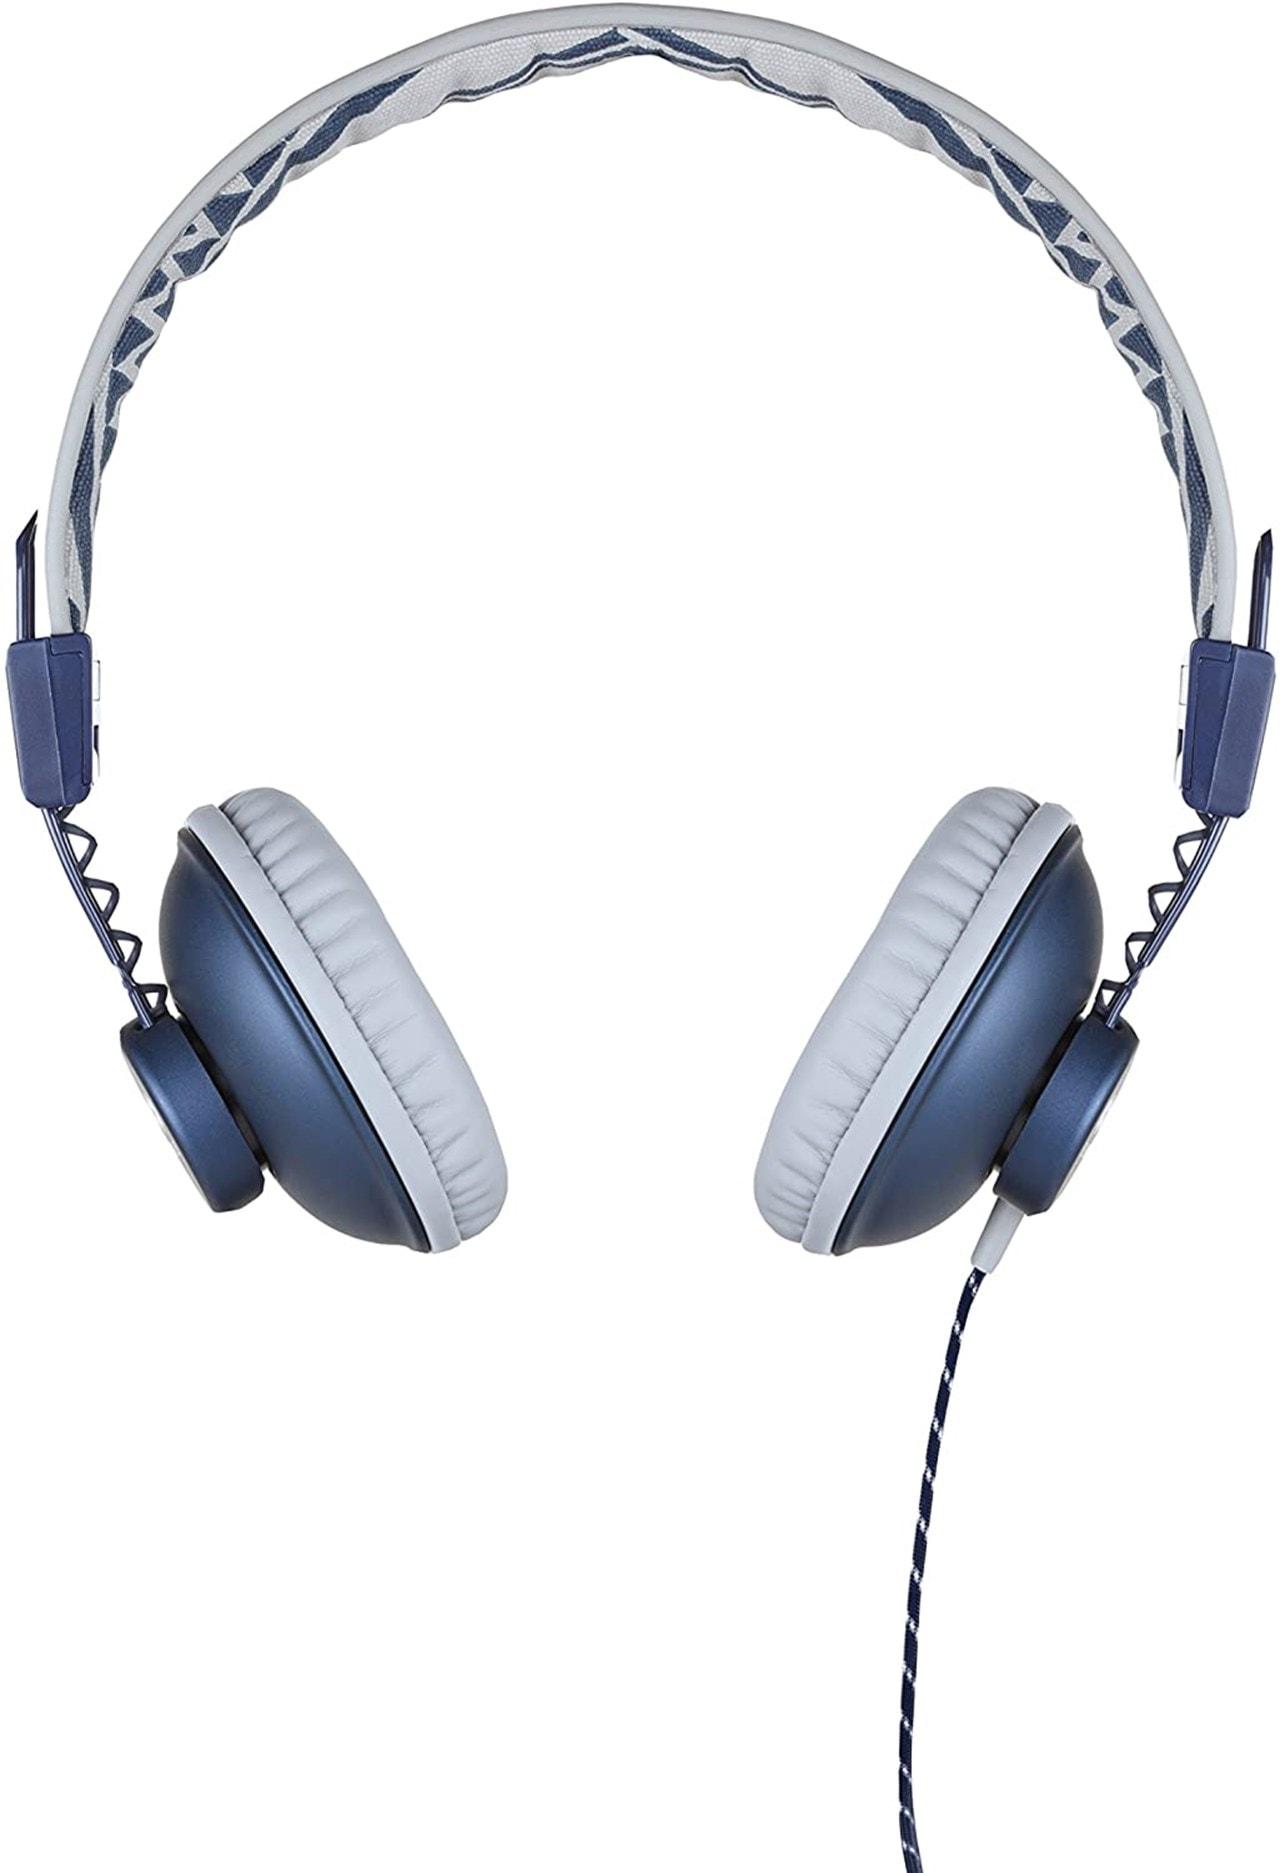 House Of Marley Positive Vibration Denim Headphones - 2